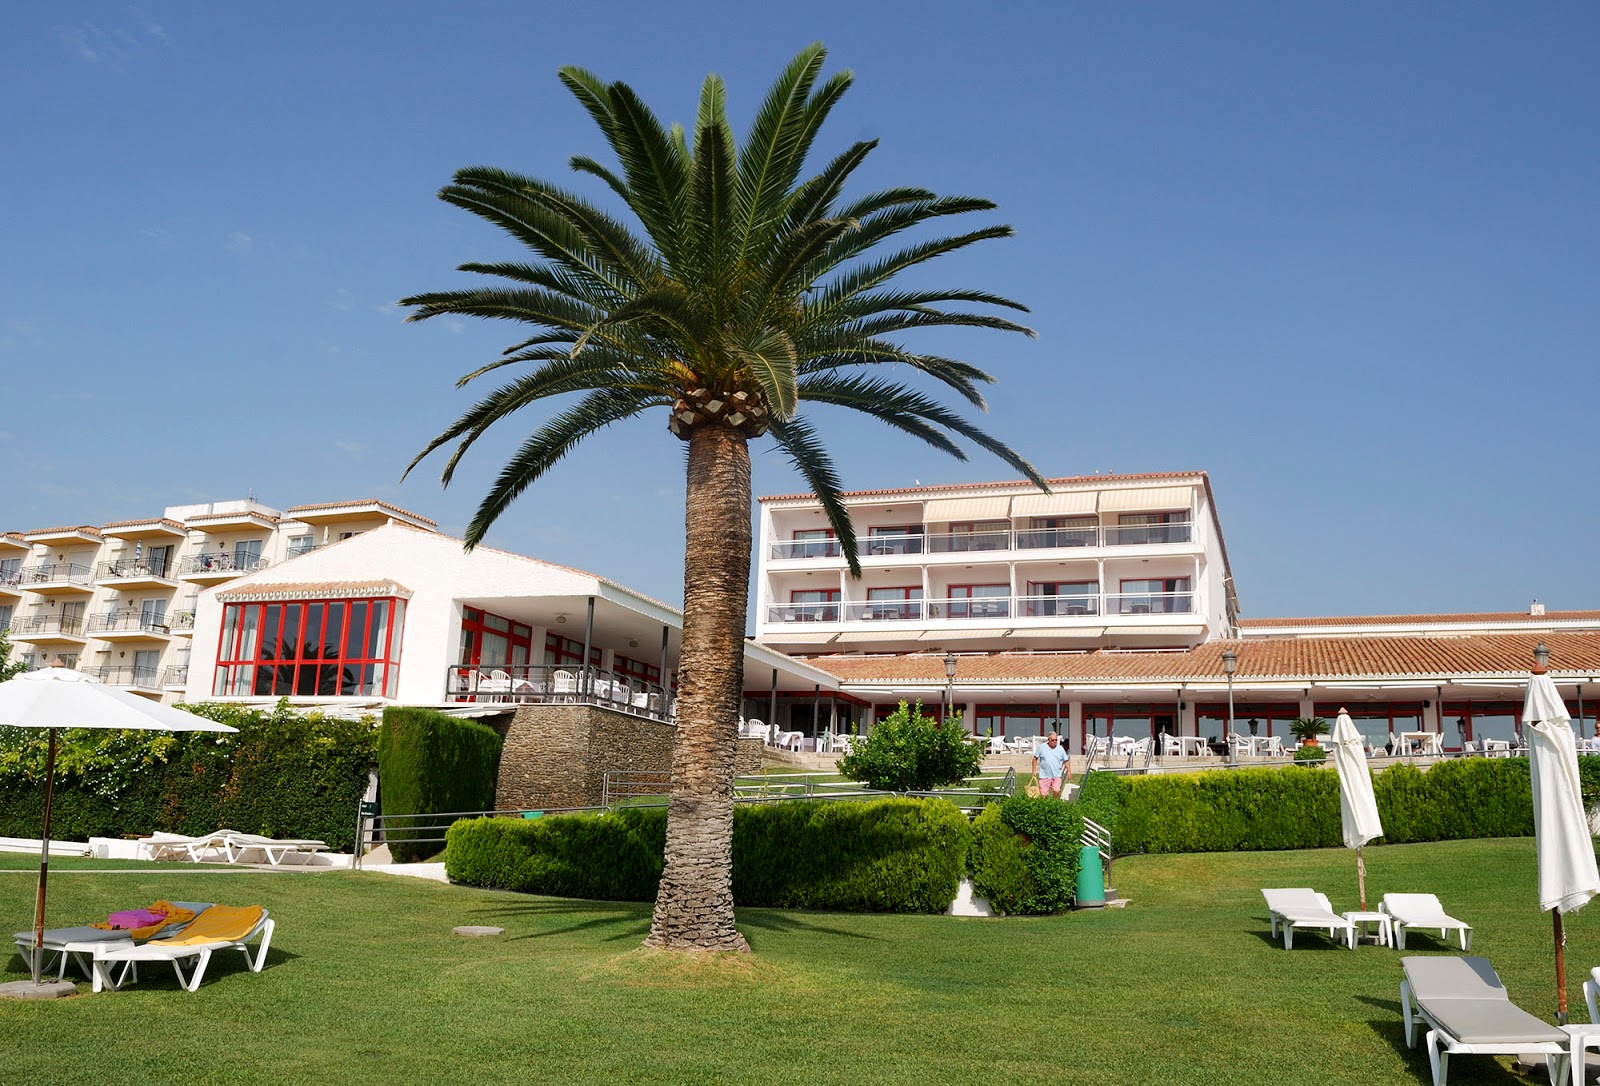 nerja malaga parador hotel andalusia spain